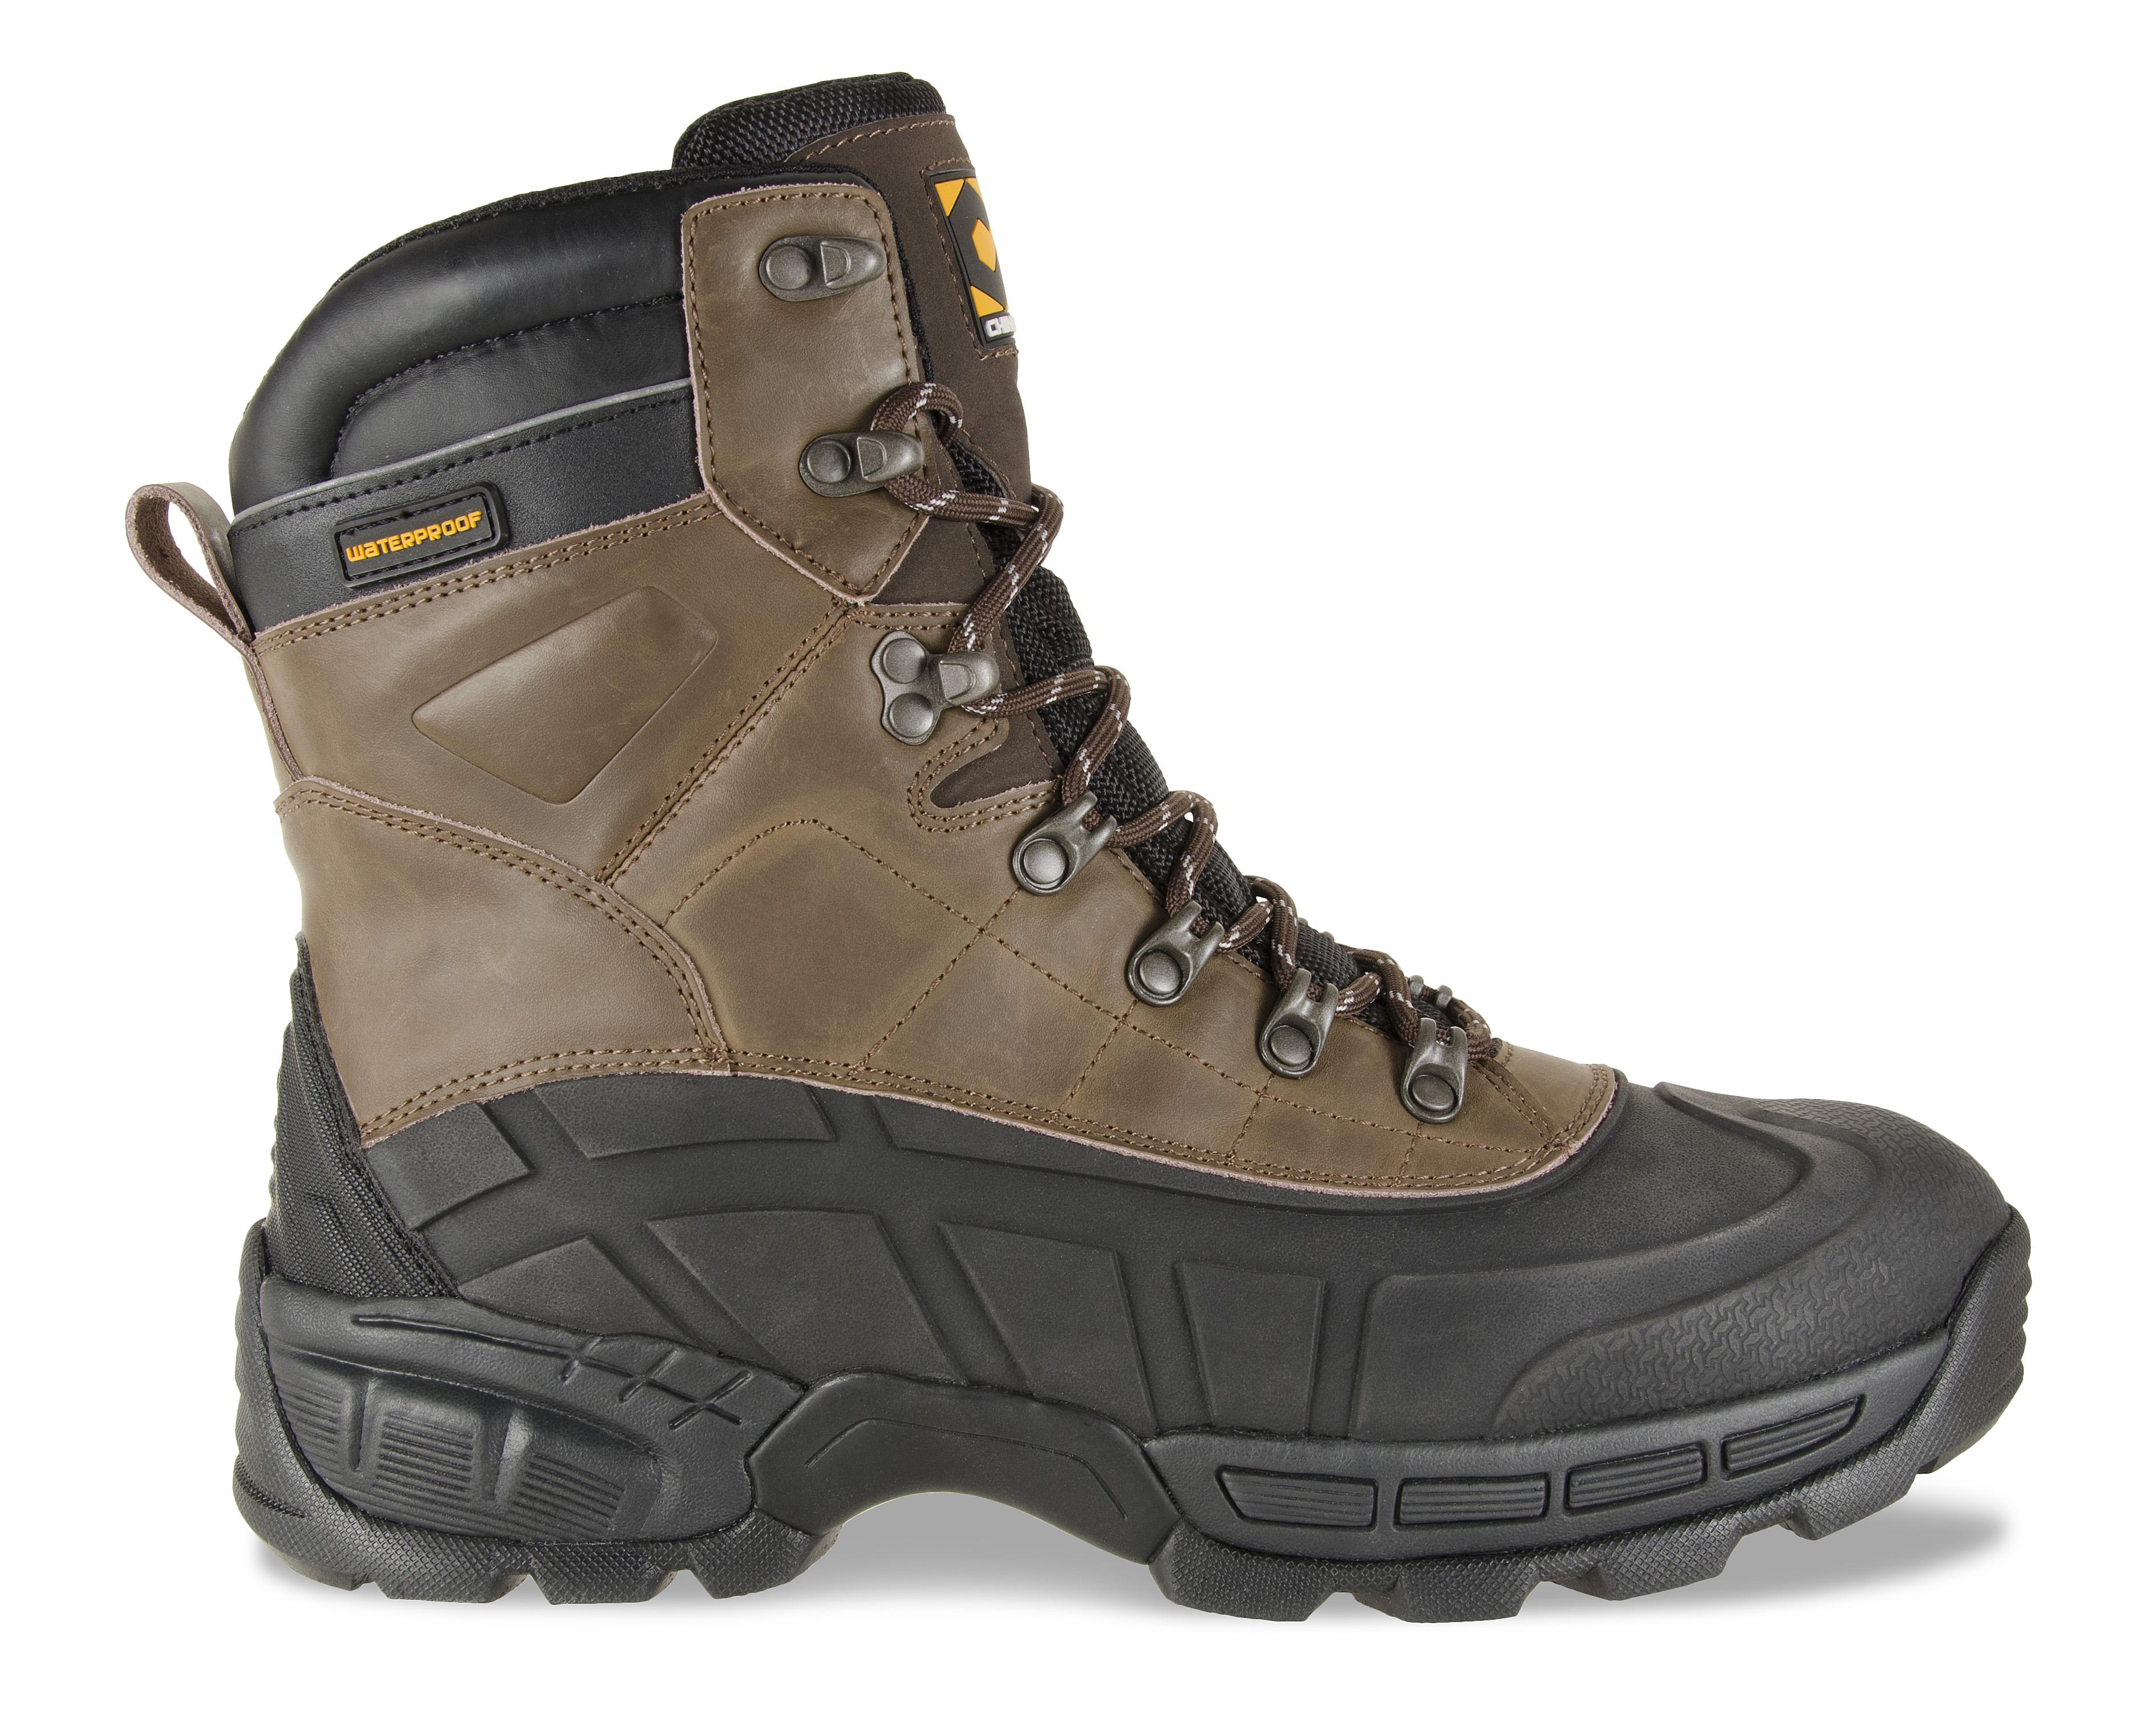 c1a3e481cbd Chinook Footwear Ice Breaker Insulated Waterproof Boots - Mens